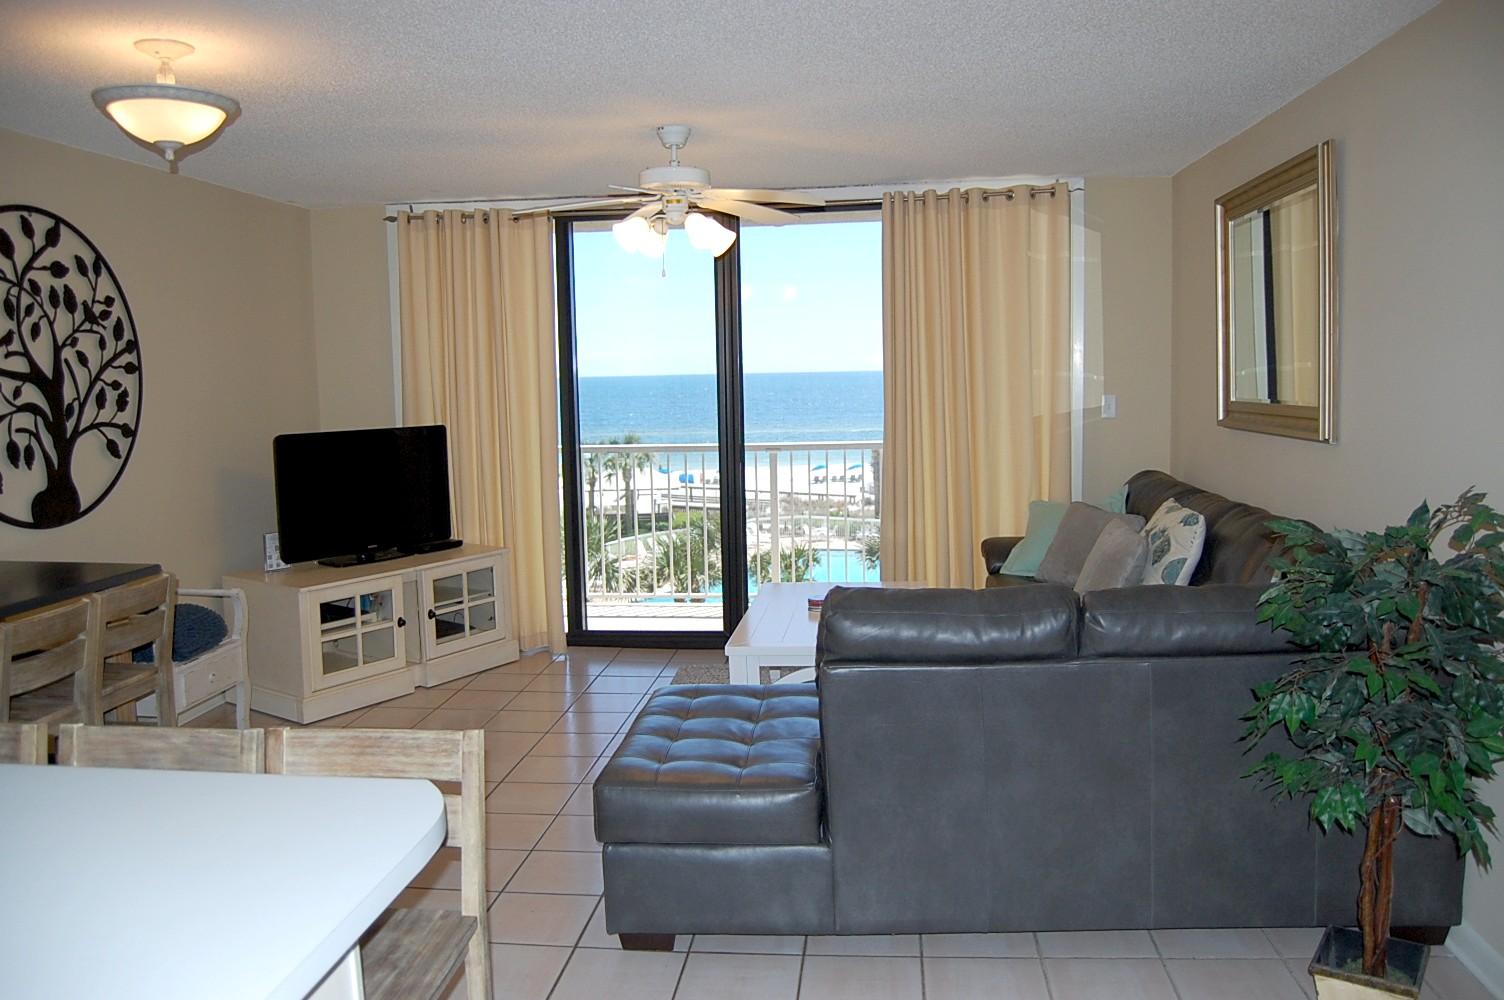 Seaside Beach & Racquet 5415 Condo rental in Seaside Beach and Racquet Club in Orange Beach Alabama - #17